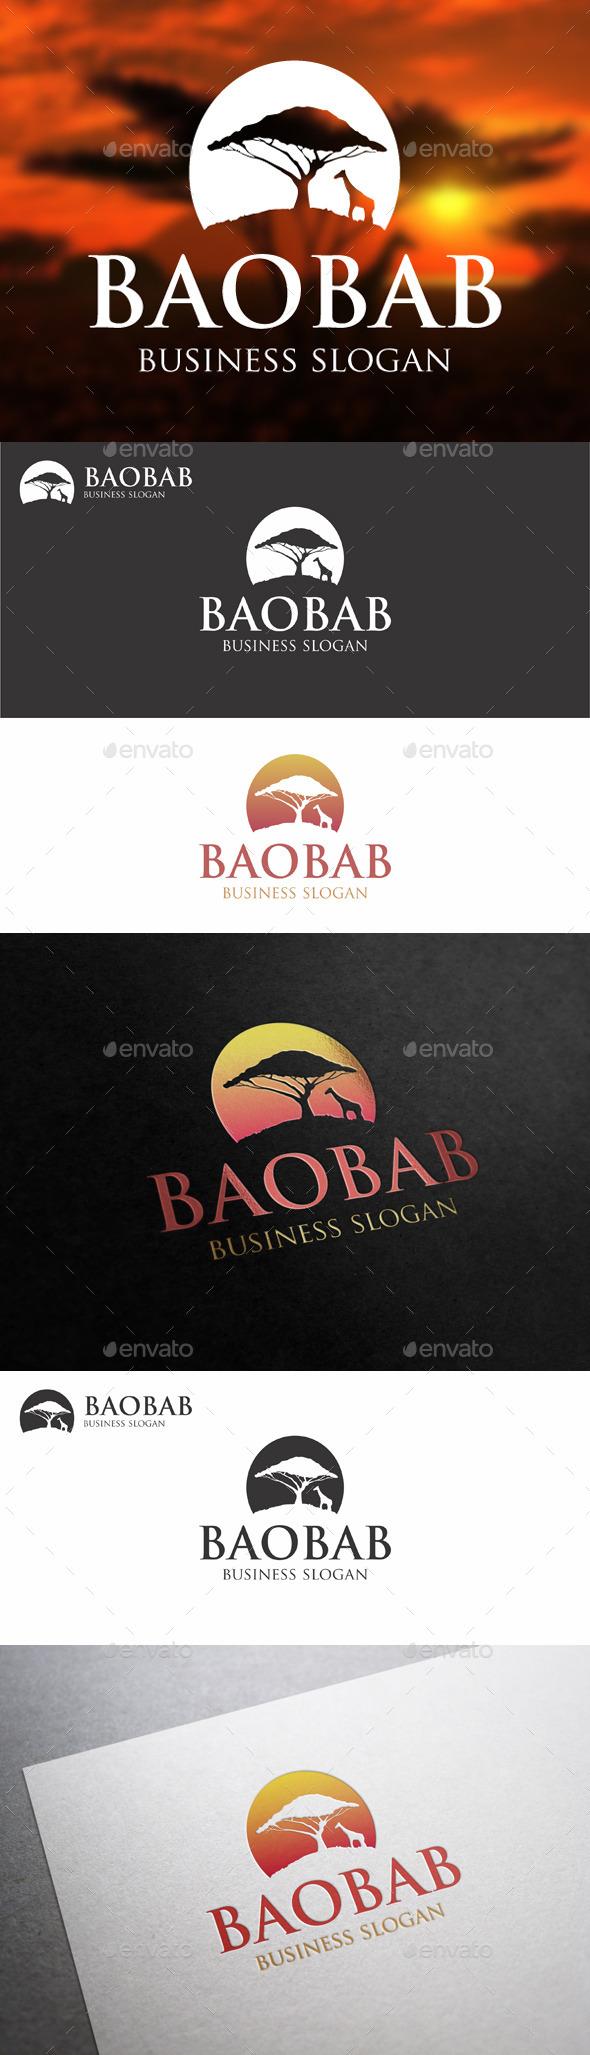 Baobab Tree - African Landscape Logo